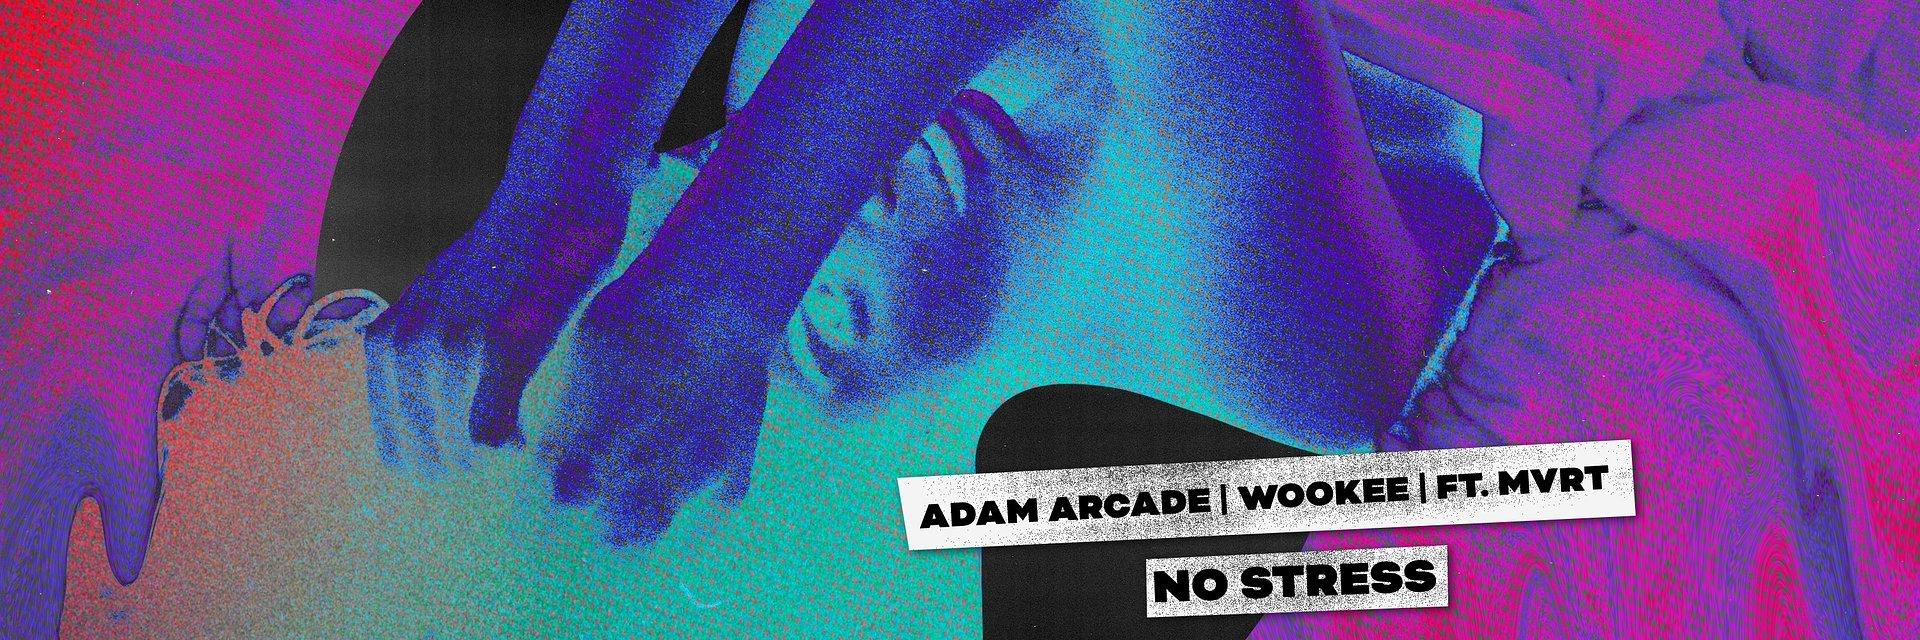 "Adam Arcade, WOOKEE i MVRT mówią ""NoStress"""